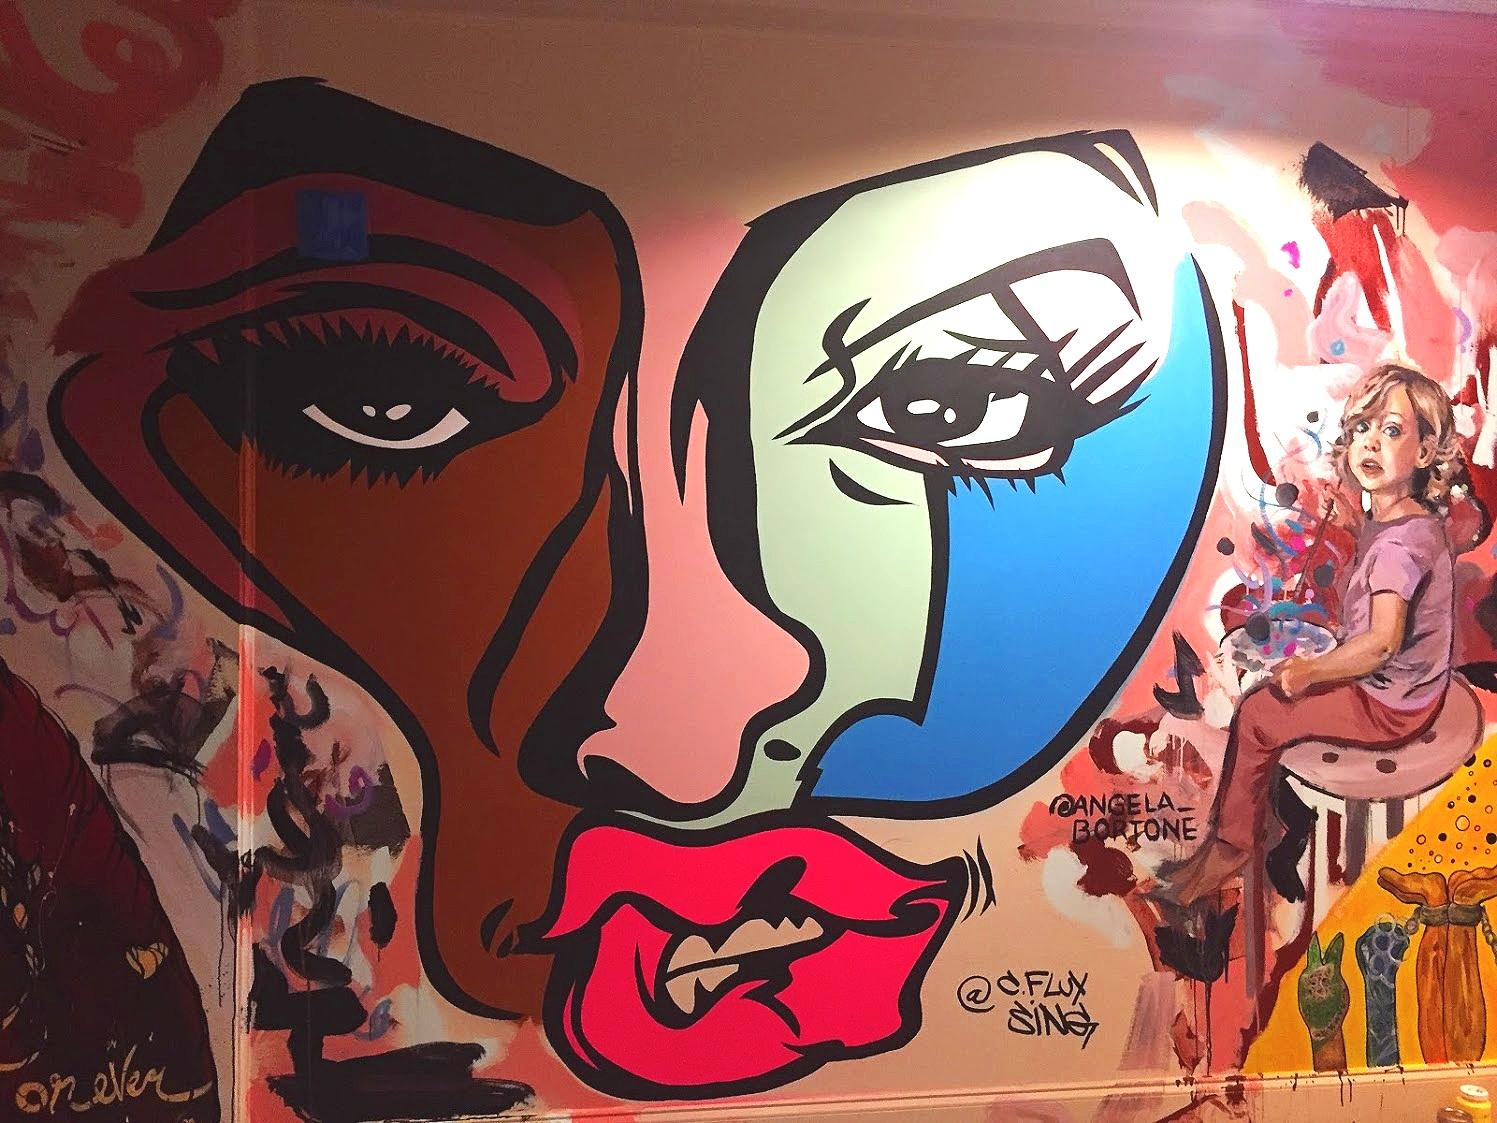 Angela_Bortone_ Mural_Moya_Mija_Featuring_art-from-C_Flux_Sing